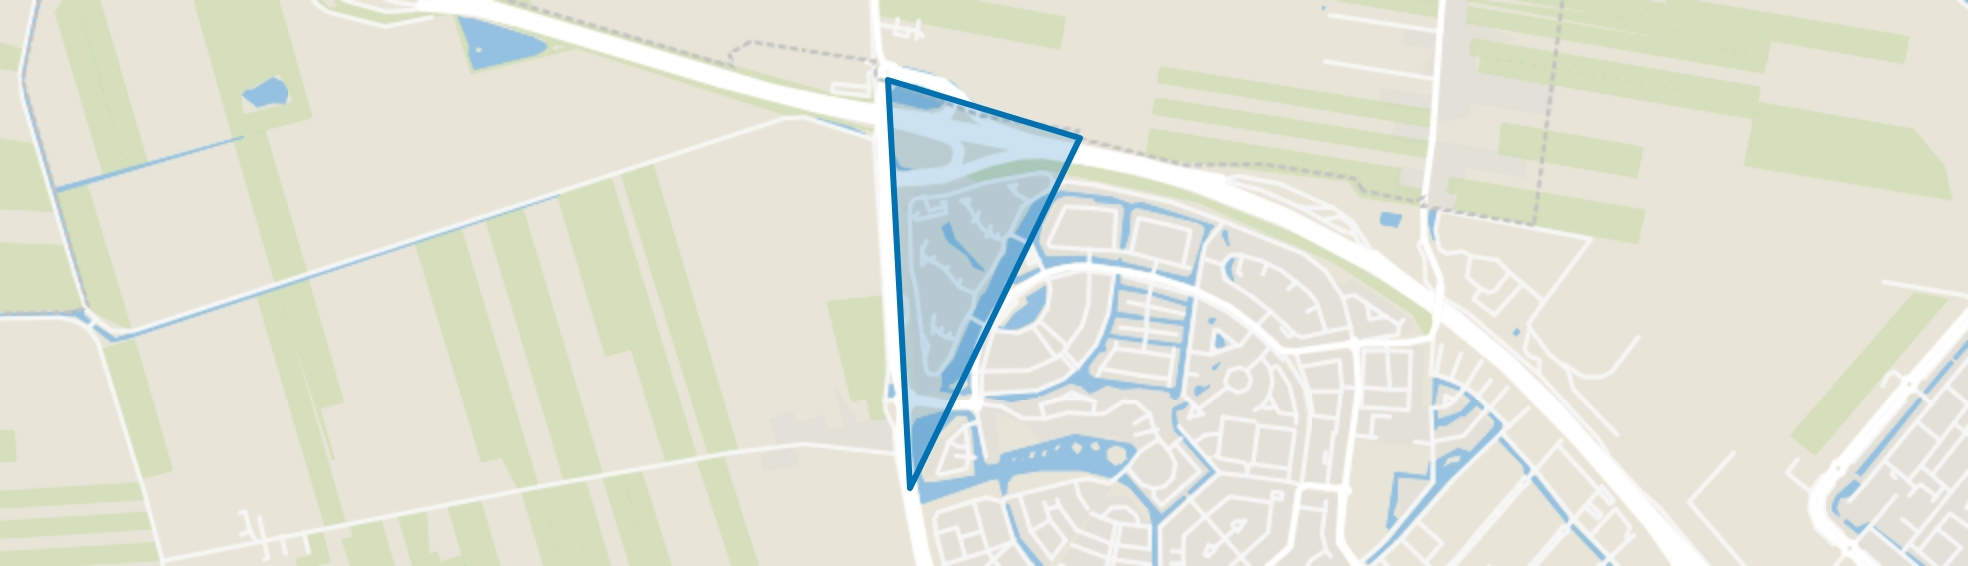 Stadstuin, Amersfoort map